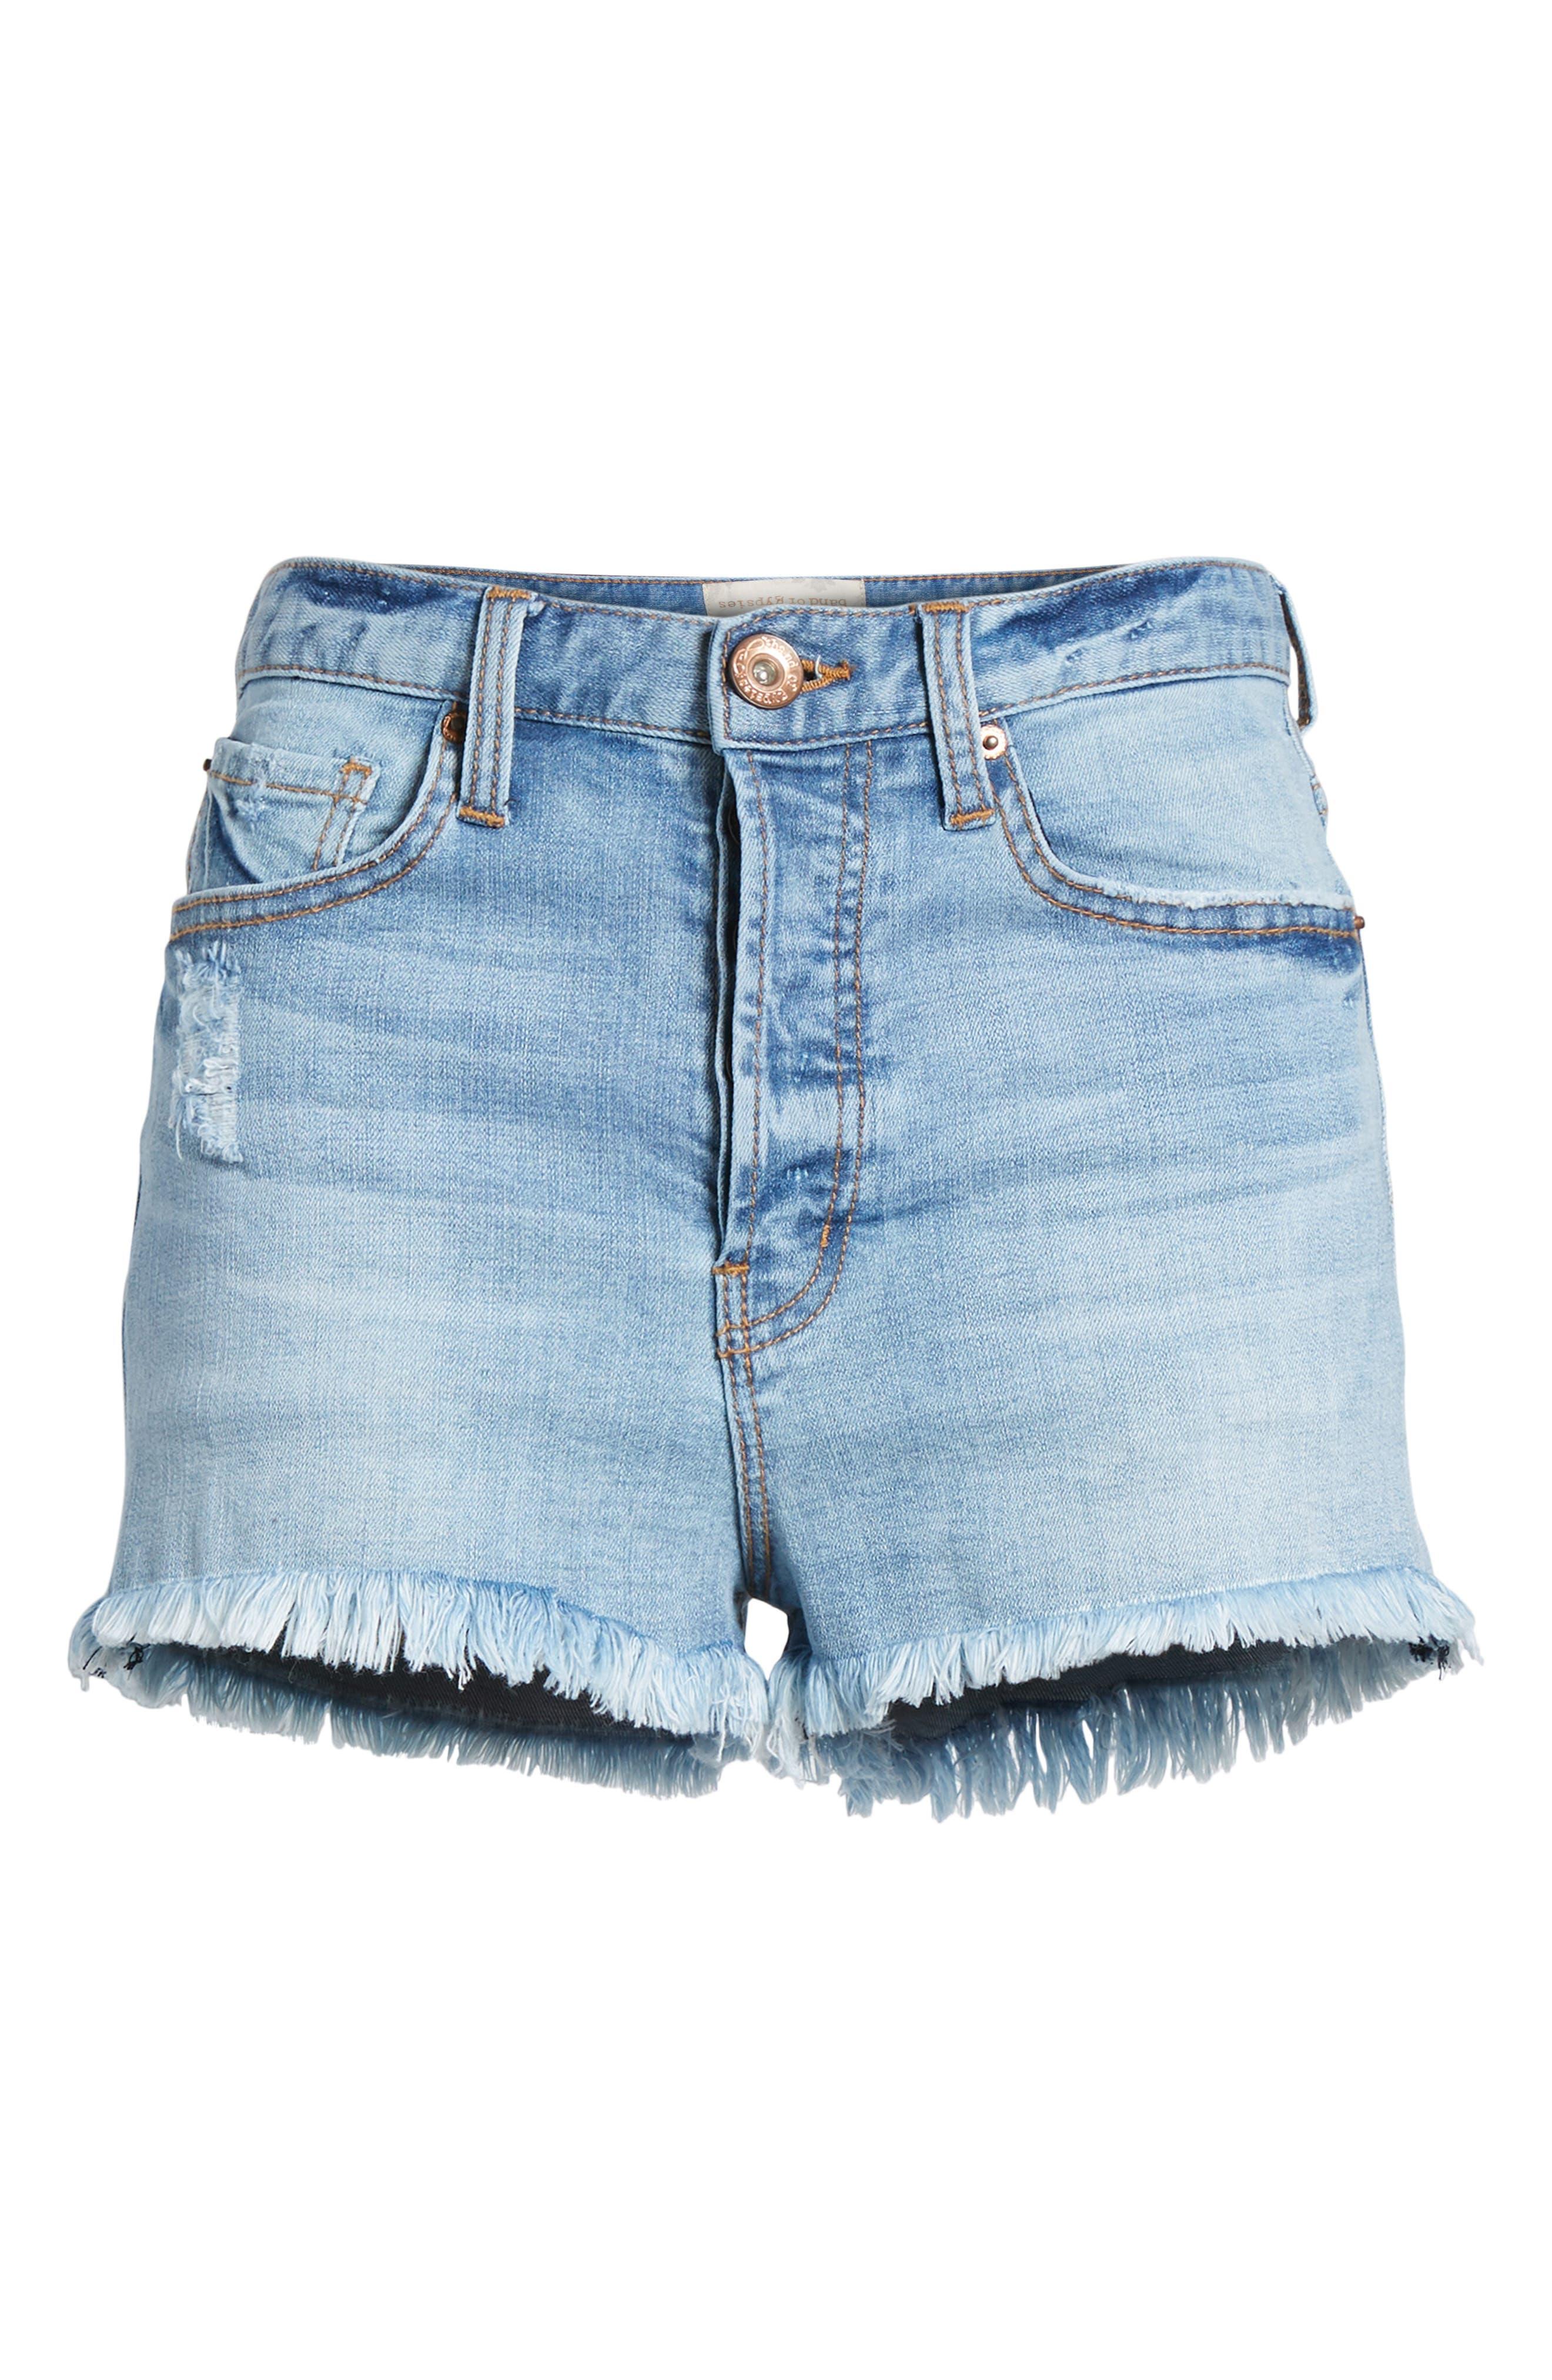 Zoey Denim Shorts,                             Alternate thumbnail 7, color,                             402